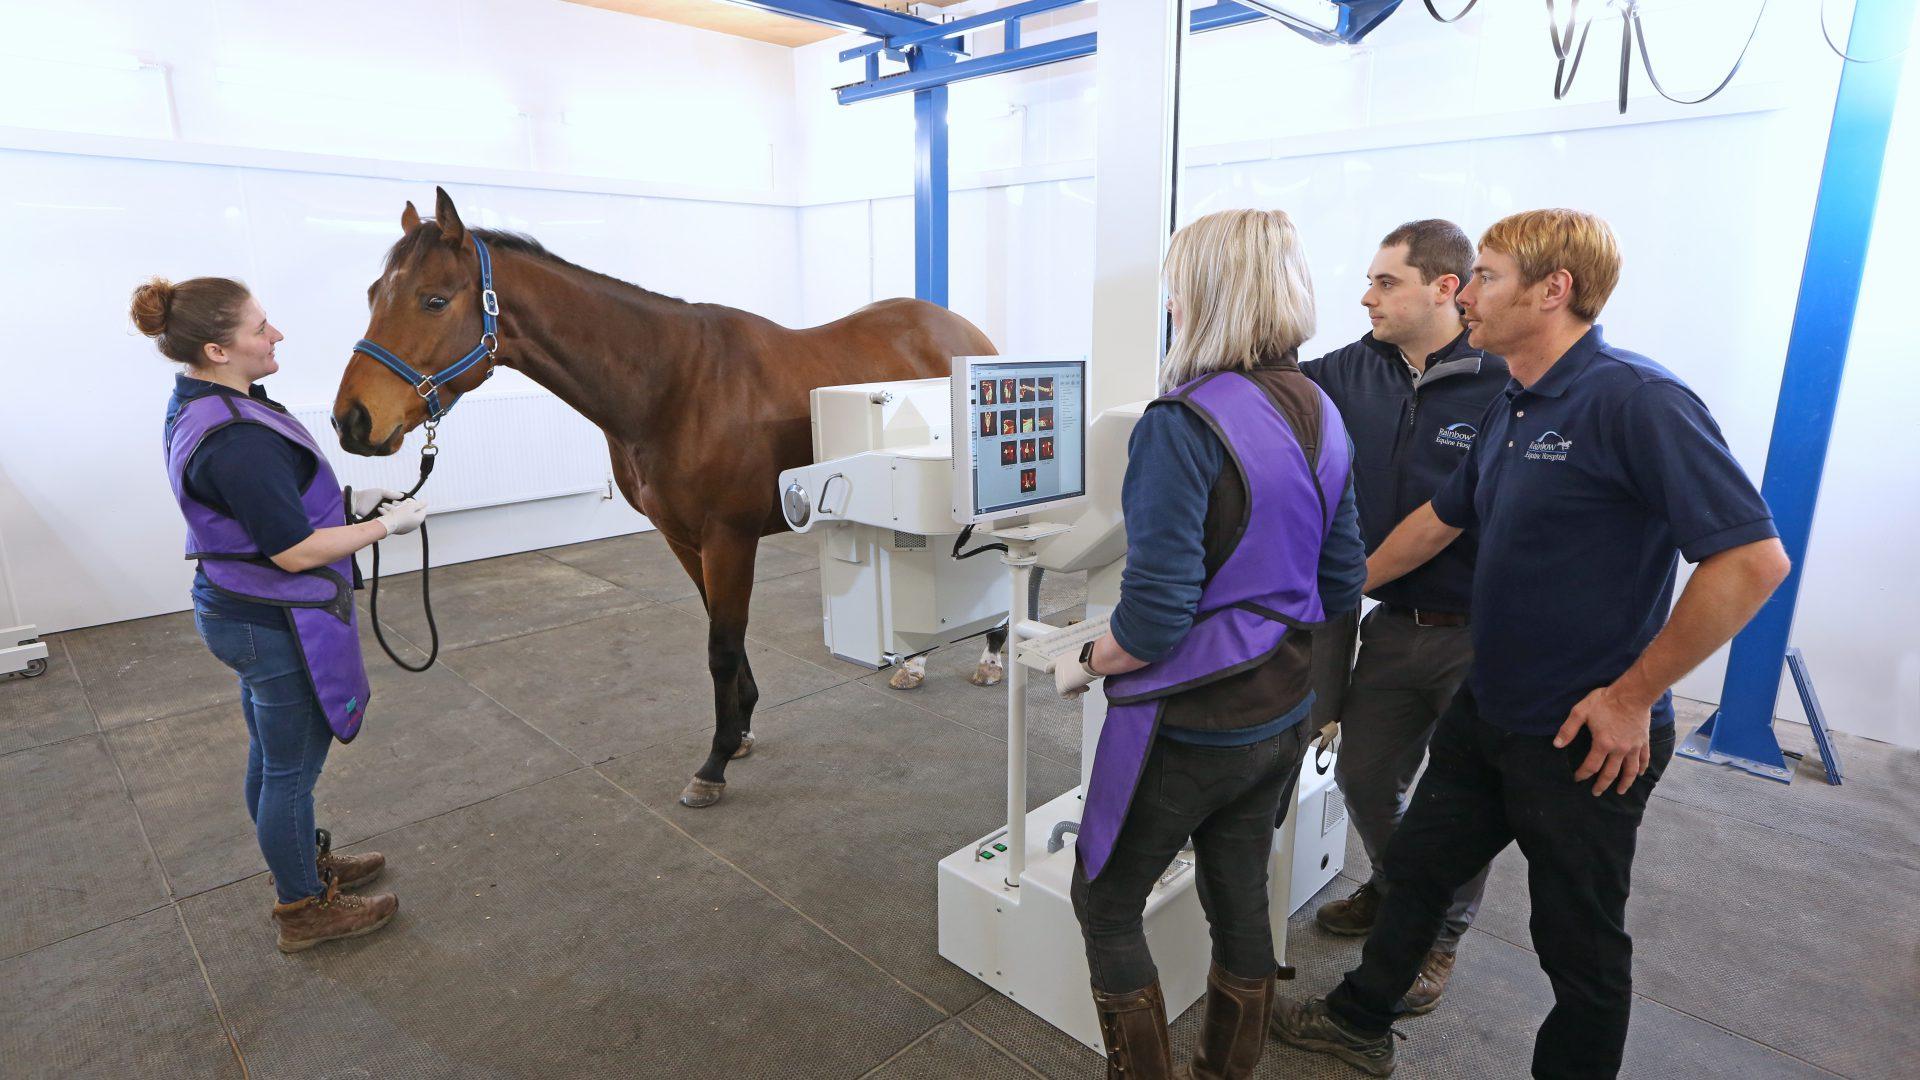 Malton equine hospital announces £230k investment in latest technology